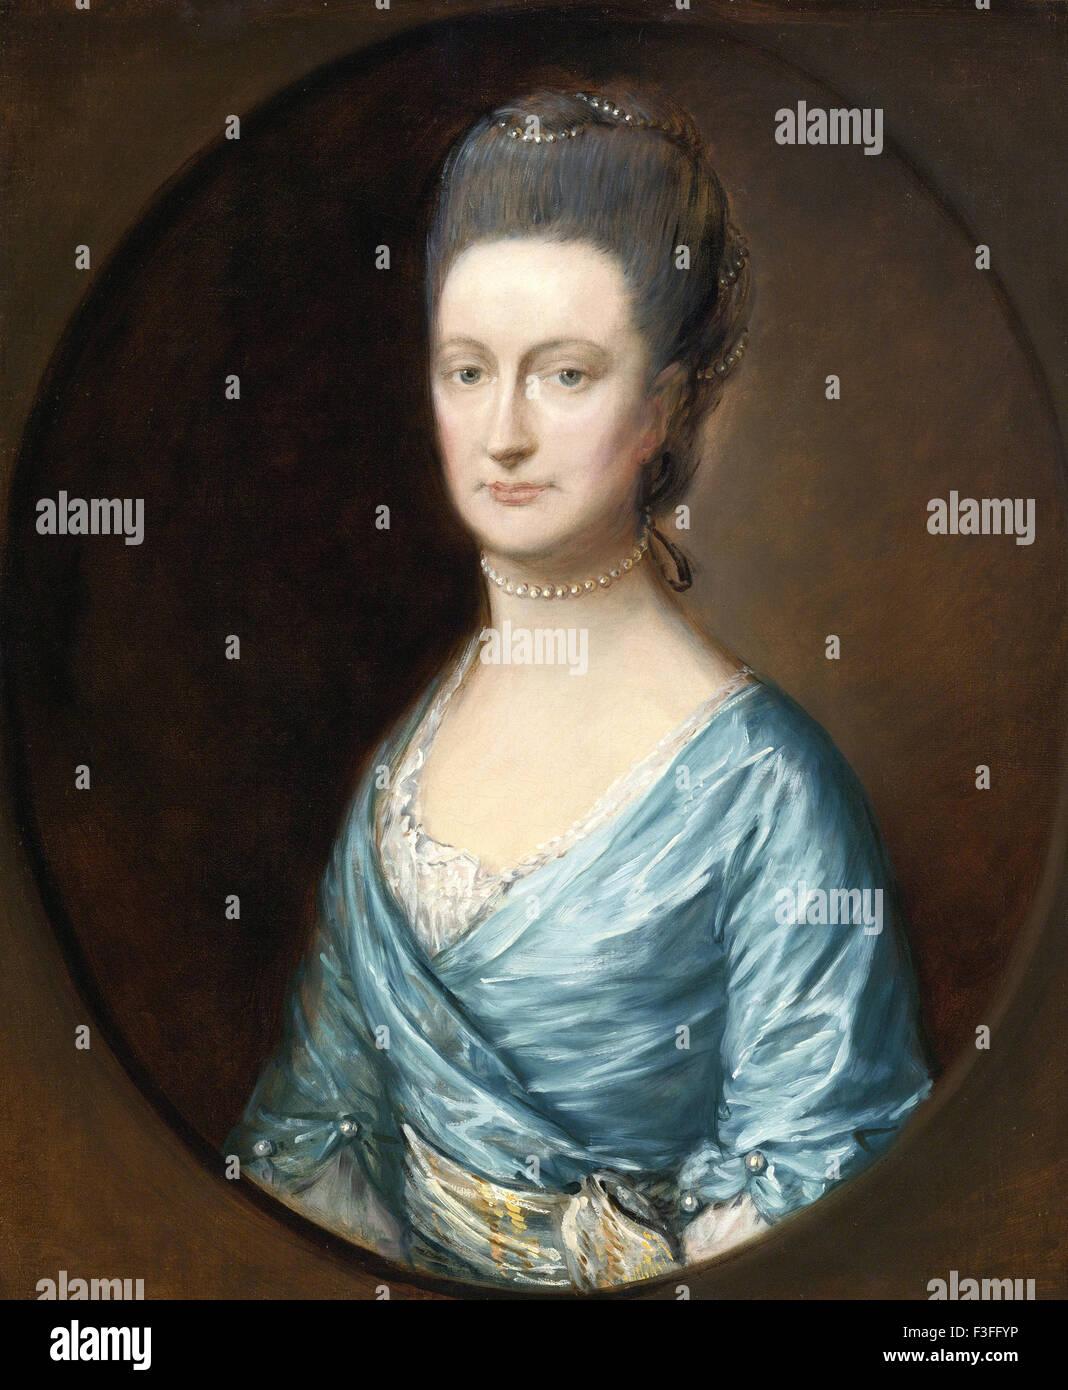 Thomas Gainsboroug - Retrato de dama Fludyer Imagen De Stock